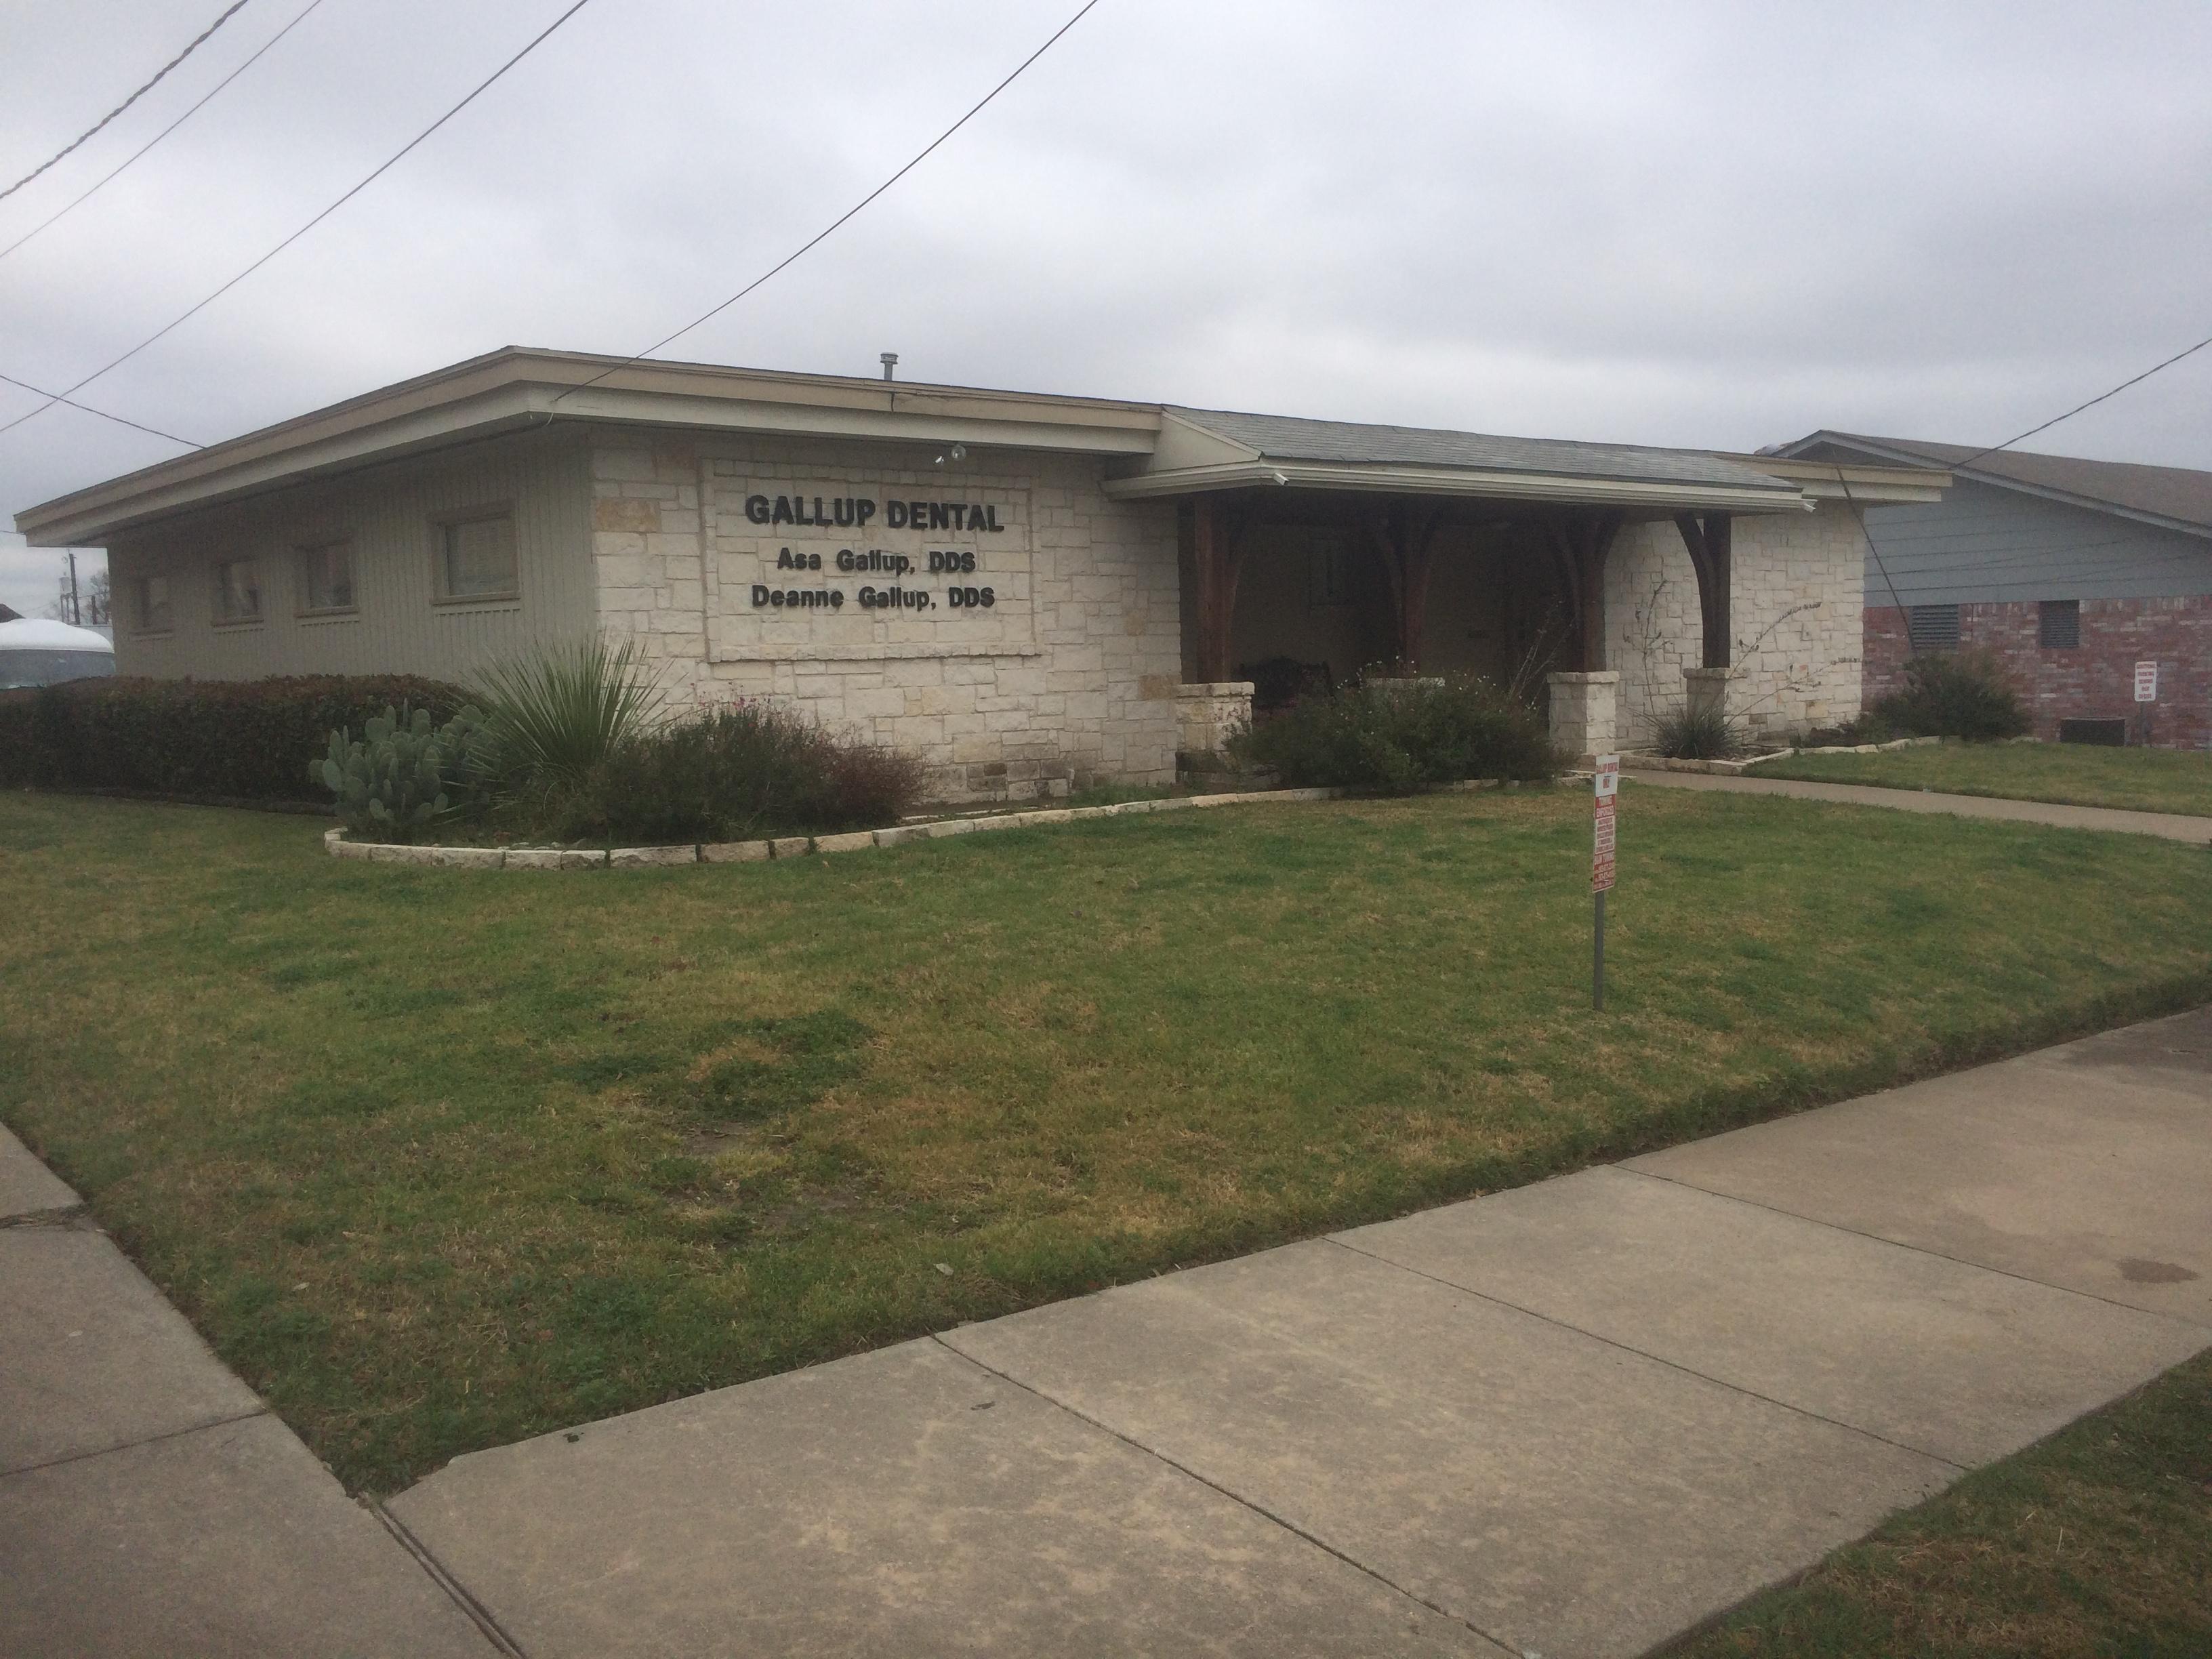 Gallup Dental, 218 W. 2nd Ave., Corsicana TX, 75110